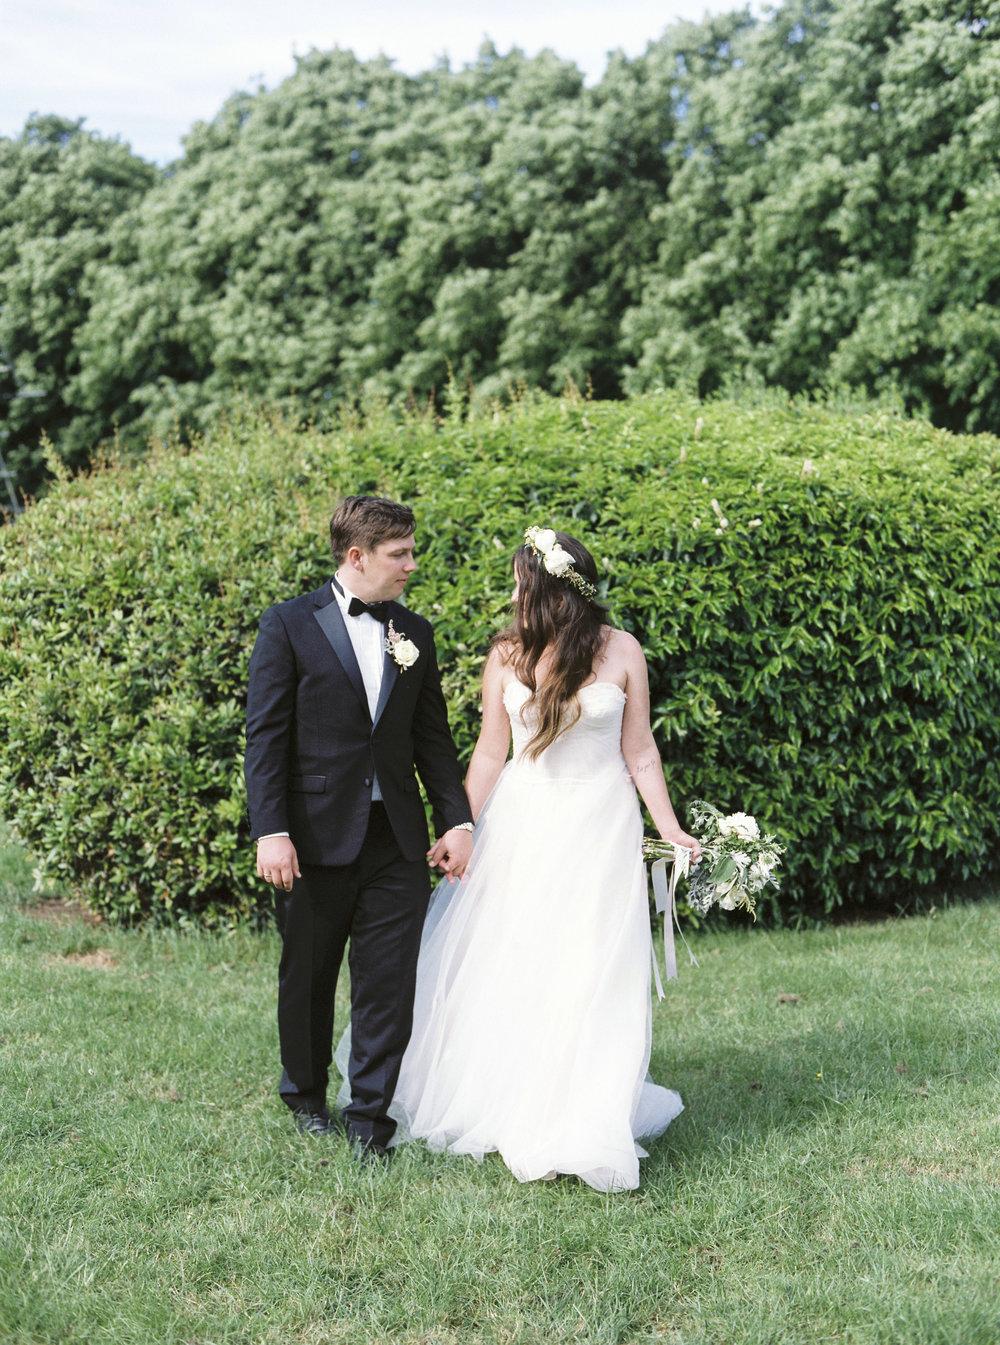 BM_Ayslum_Peakham_Wedding_ZosiaZachariaPhotography191.JPG